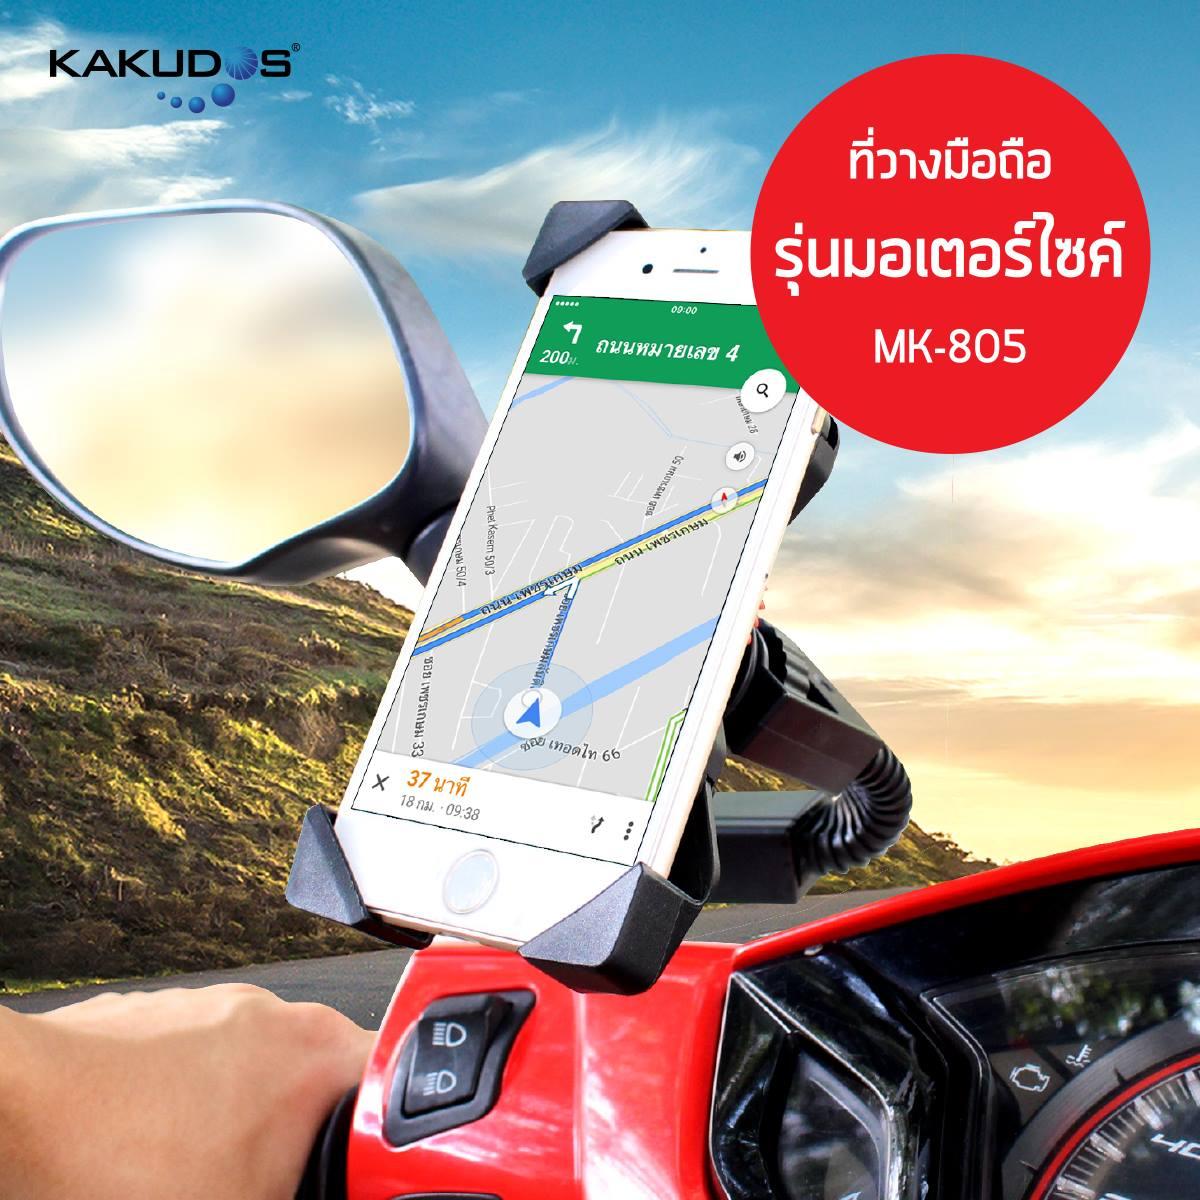 KAKUDOS MK-805 ที่วางโทรศัพท์สำหรับมอเตอร์ไซค์ ใช้ติดตั้งกับกระจกข้าง แท้